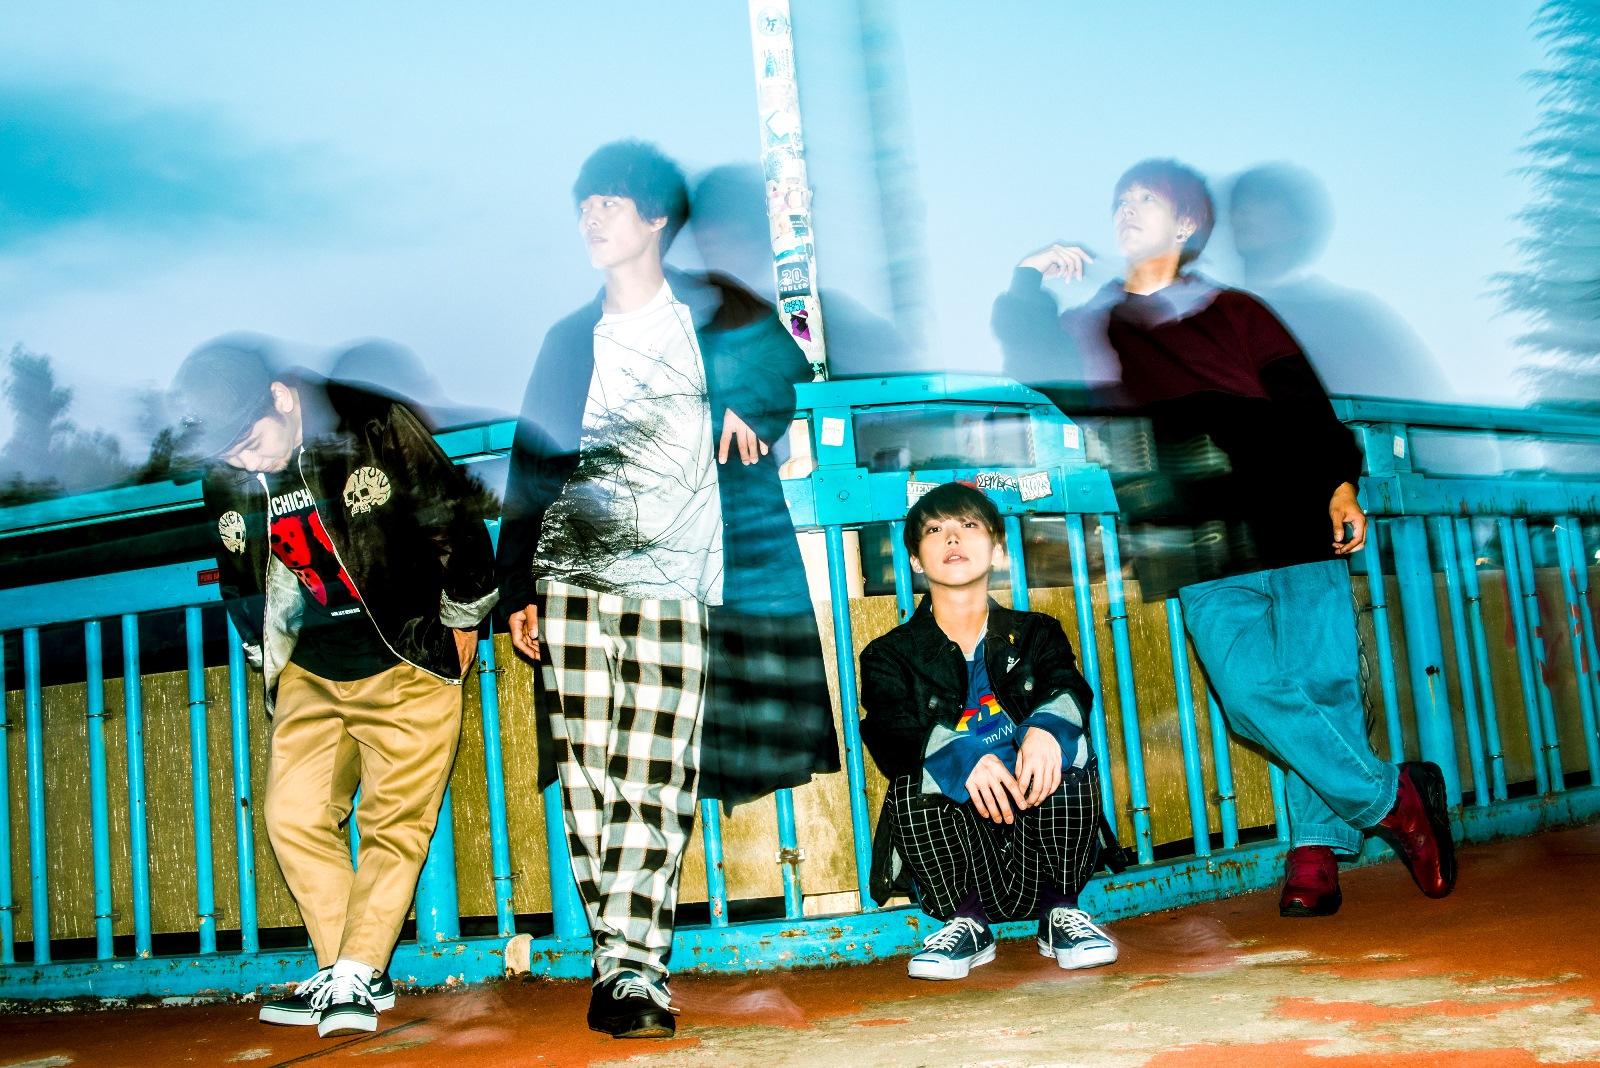 04 Limited Sazabys 新曲 Montage が新火9ドラマ Two Weeks オープニング曲に決定 日本コロムビア株式会社のプレスリリース